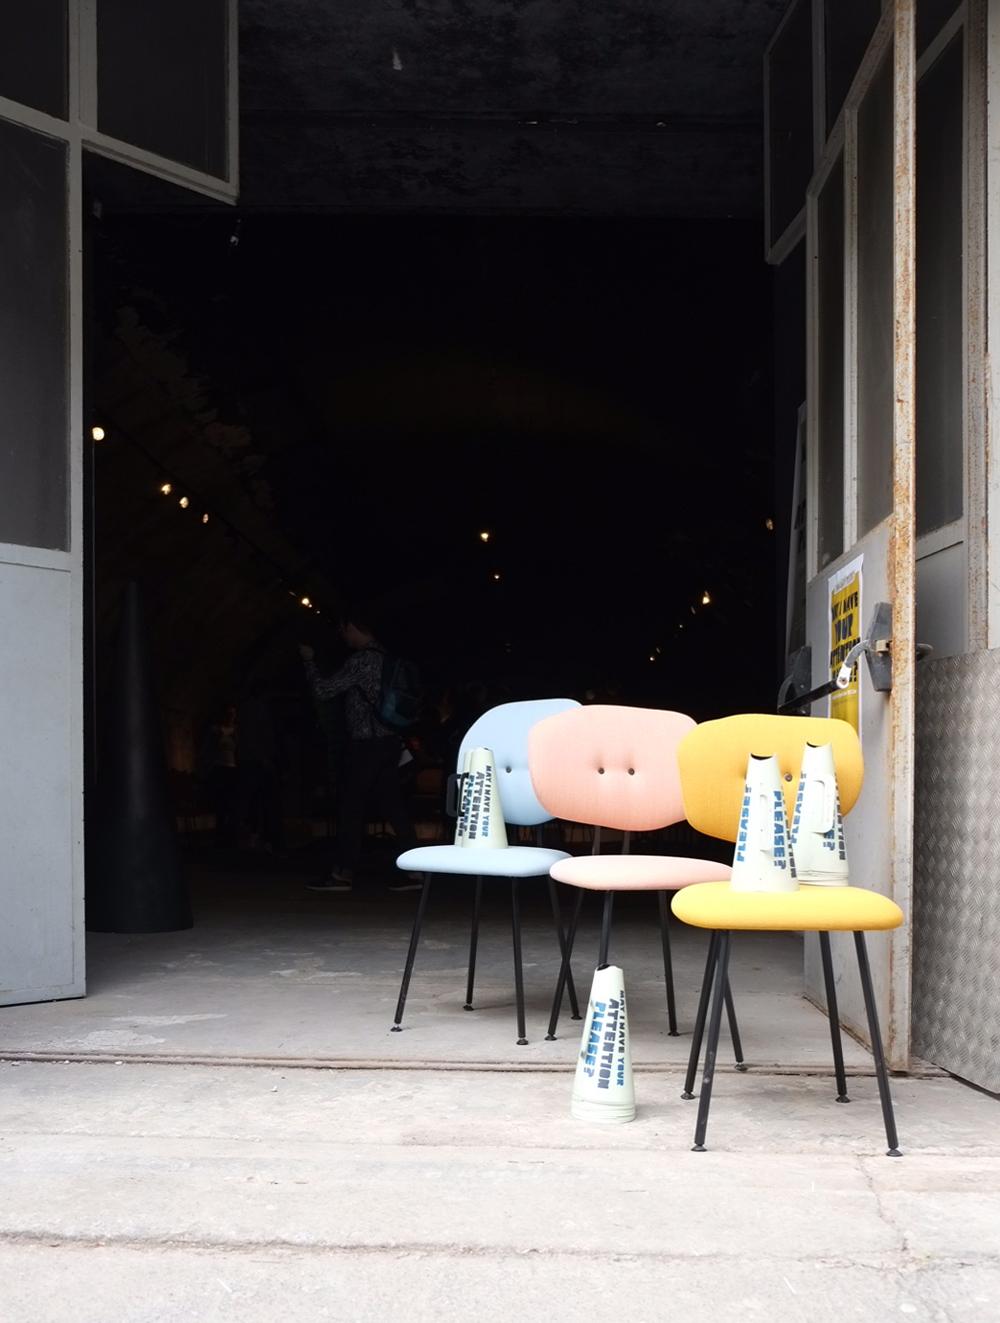 Pimpelwit interieurontwerp-salone del mobile-maarten baas-ventura centrale